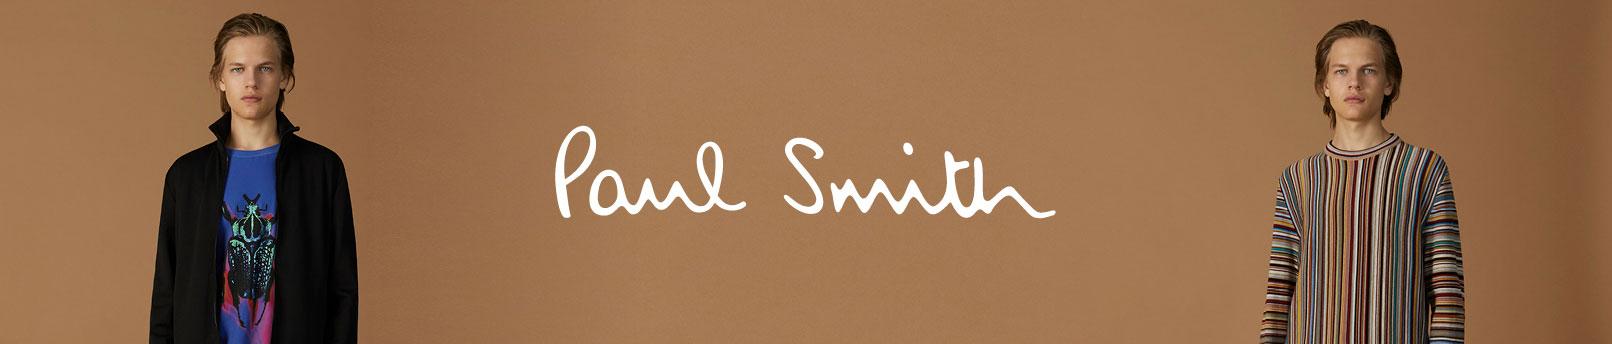 Shop Paul Smith